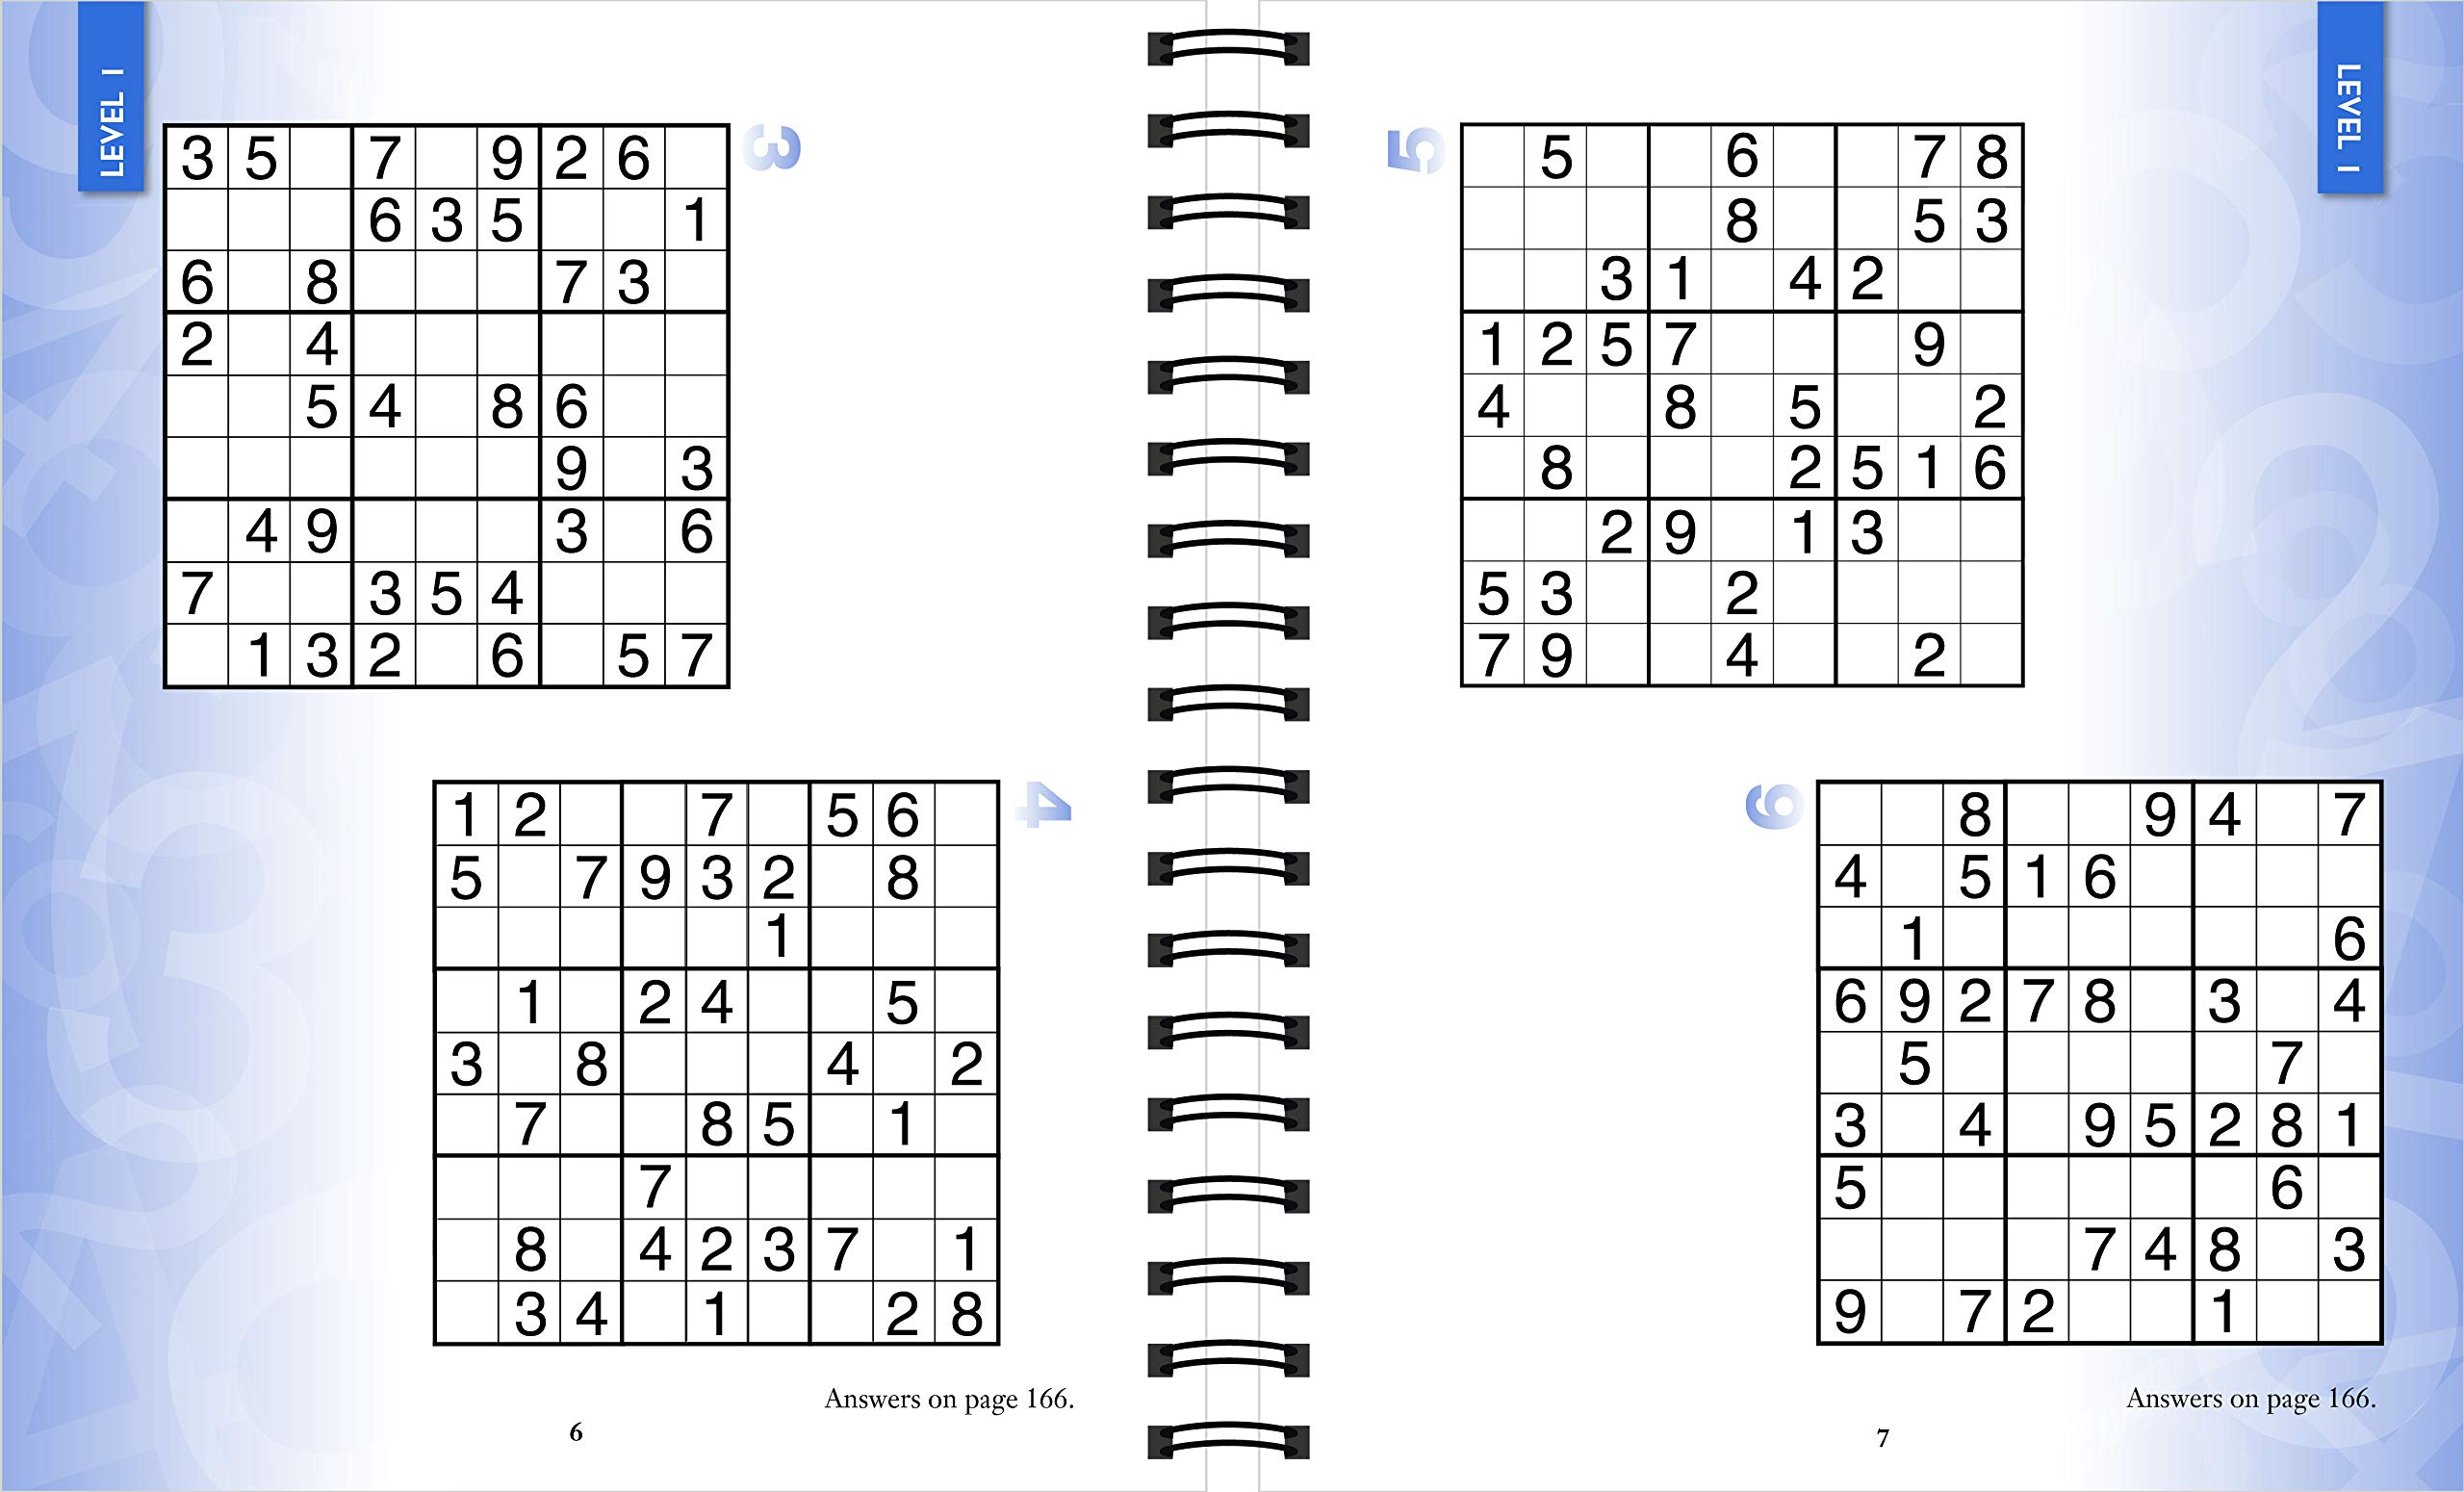 Amazon.com: Brain Games® Sudoku (9781605531731): Publications International  Ltd.: Books